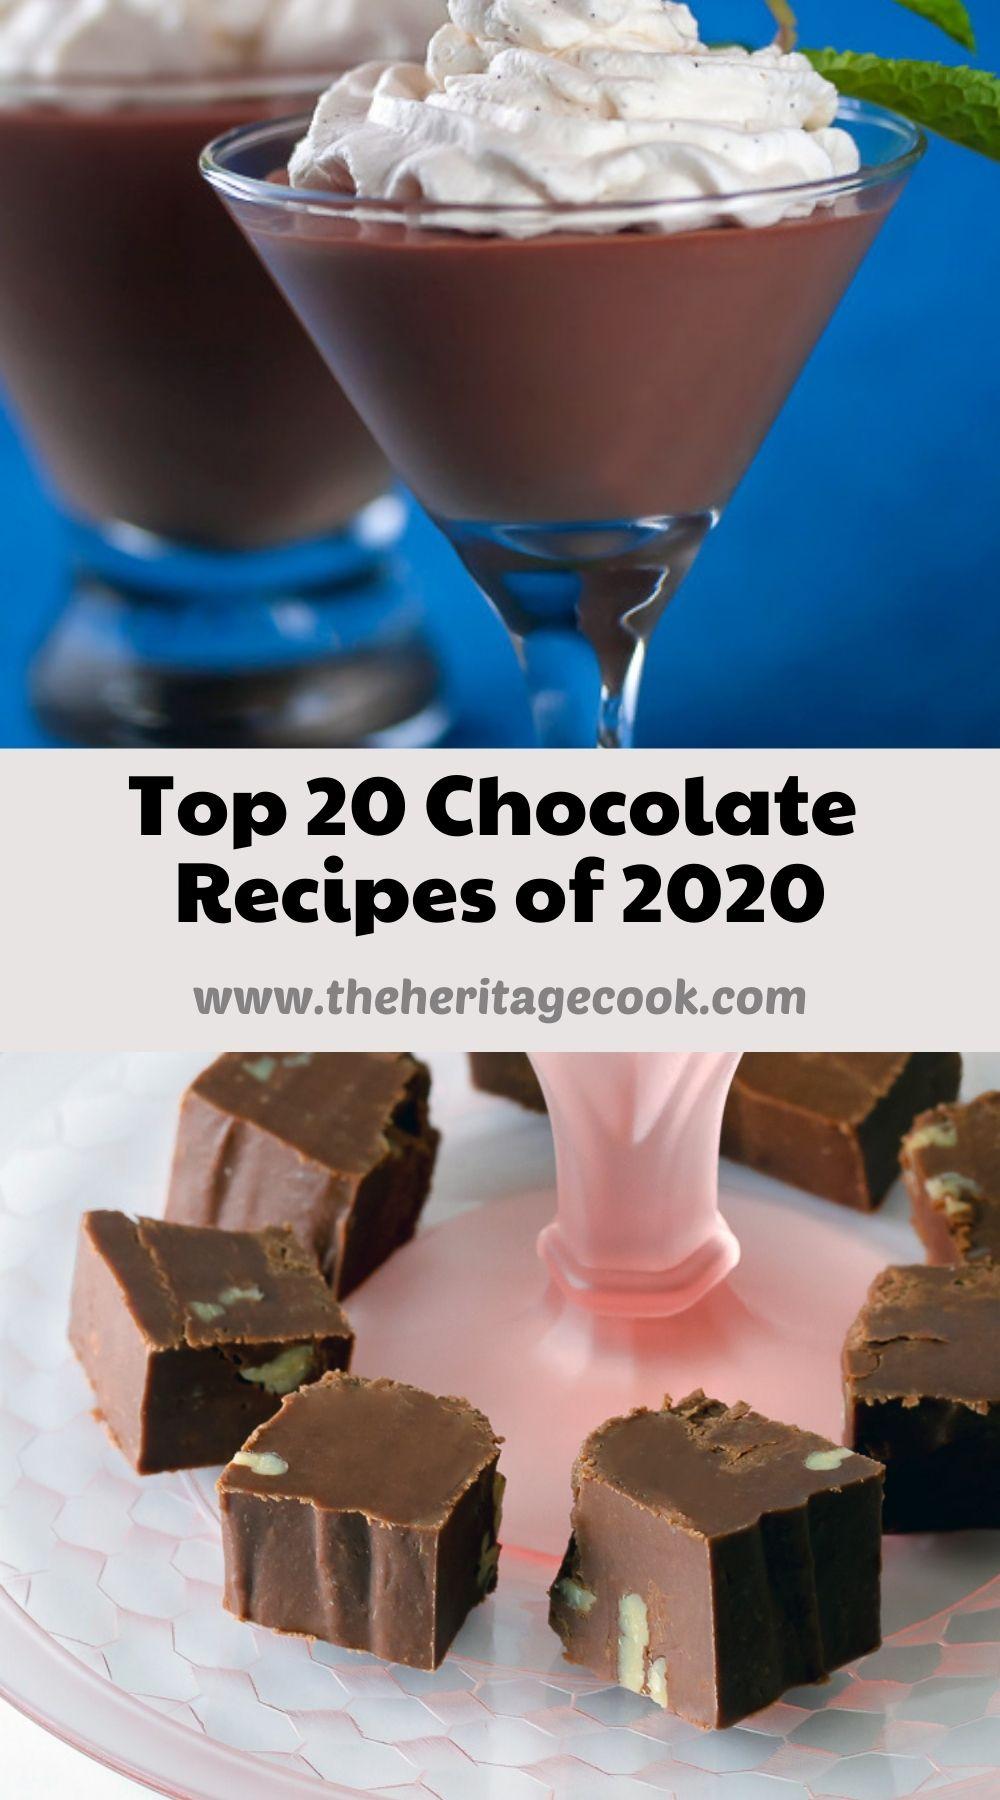 Top 20 Chocolate Recipes of 2020 Jane Bonacci, The Heritage Cook